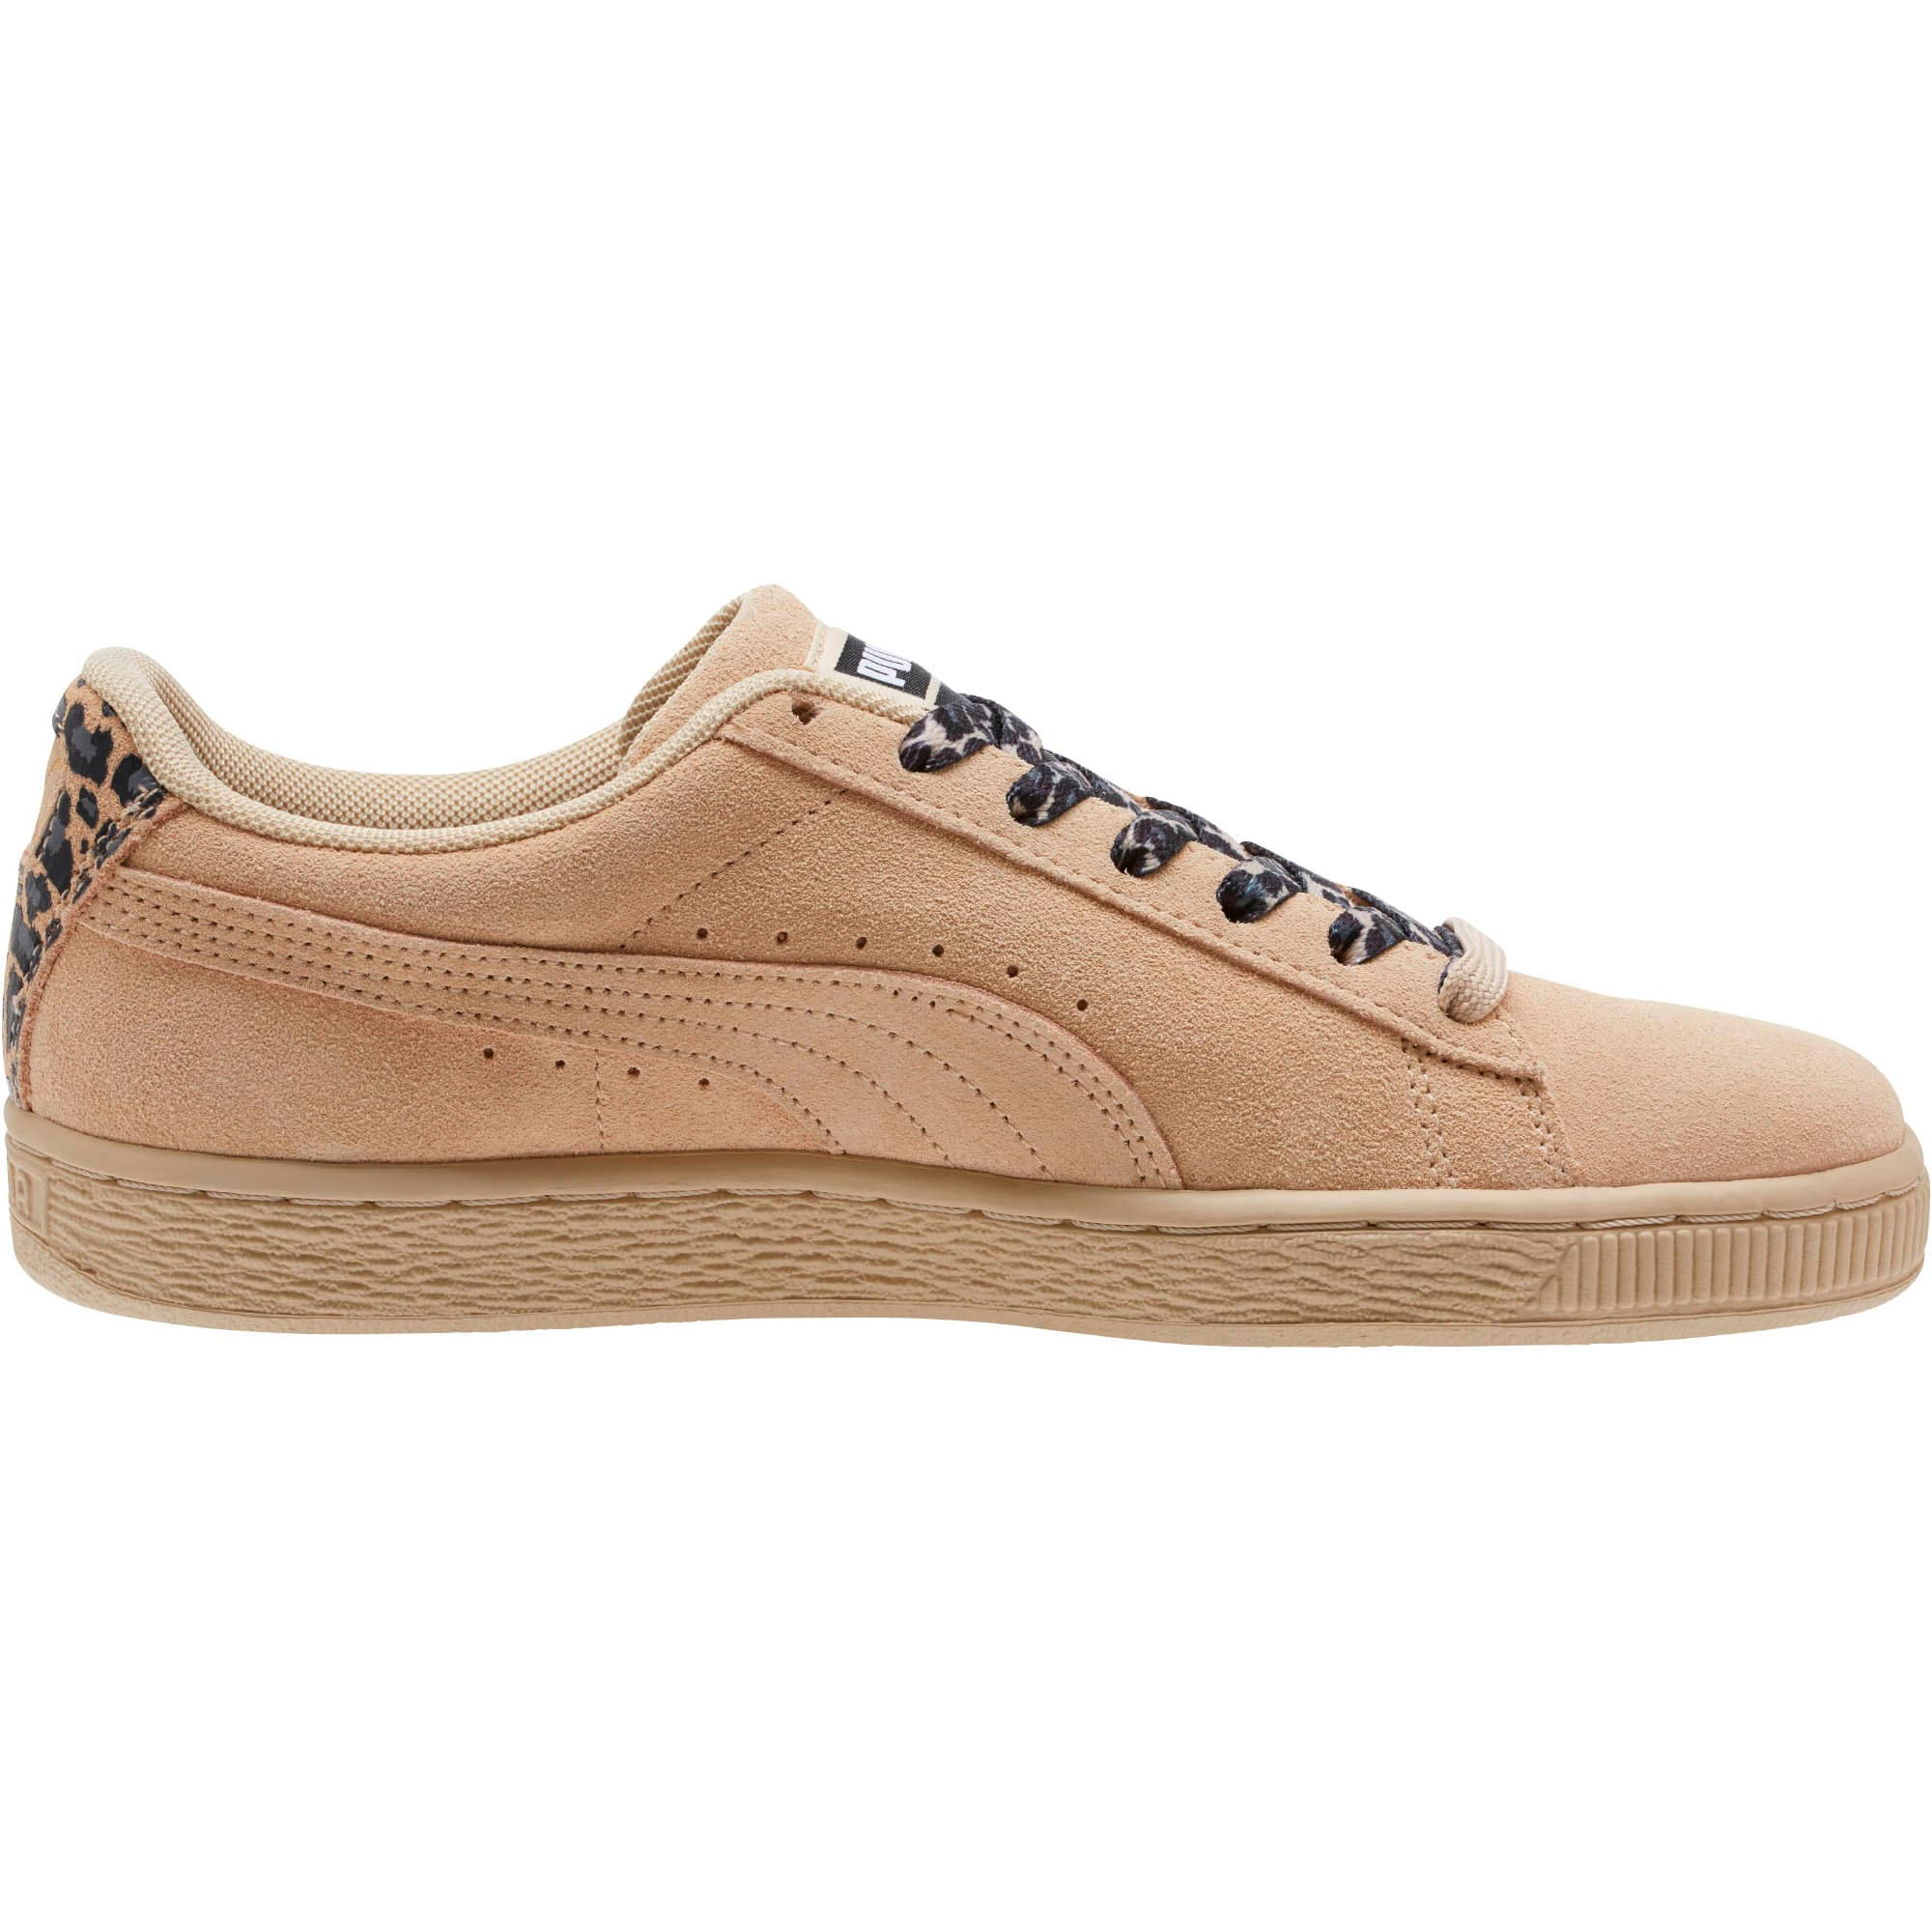 Thumbnail 3 of Suede Wild Women's Sneakers, Pebble- Gold-Puma Black, medium